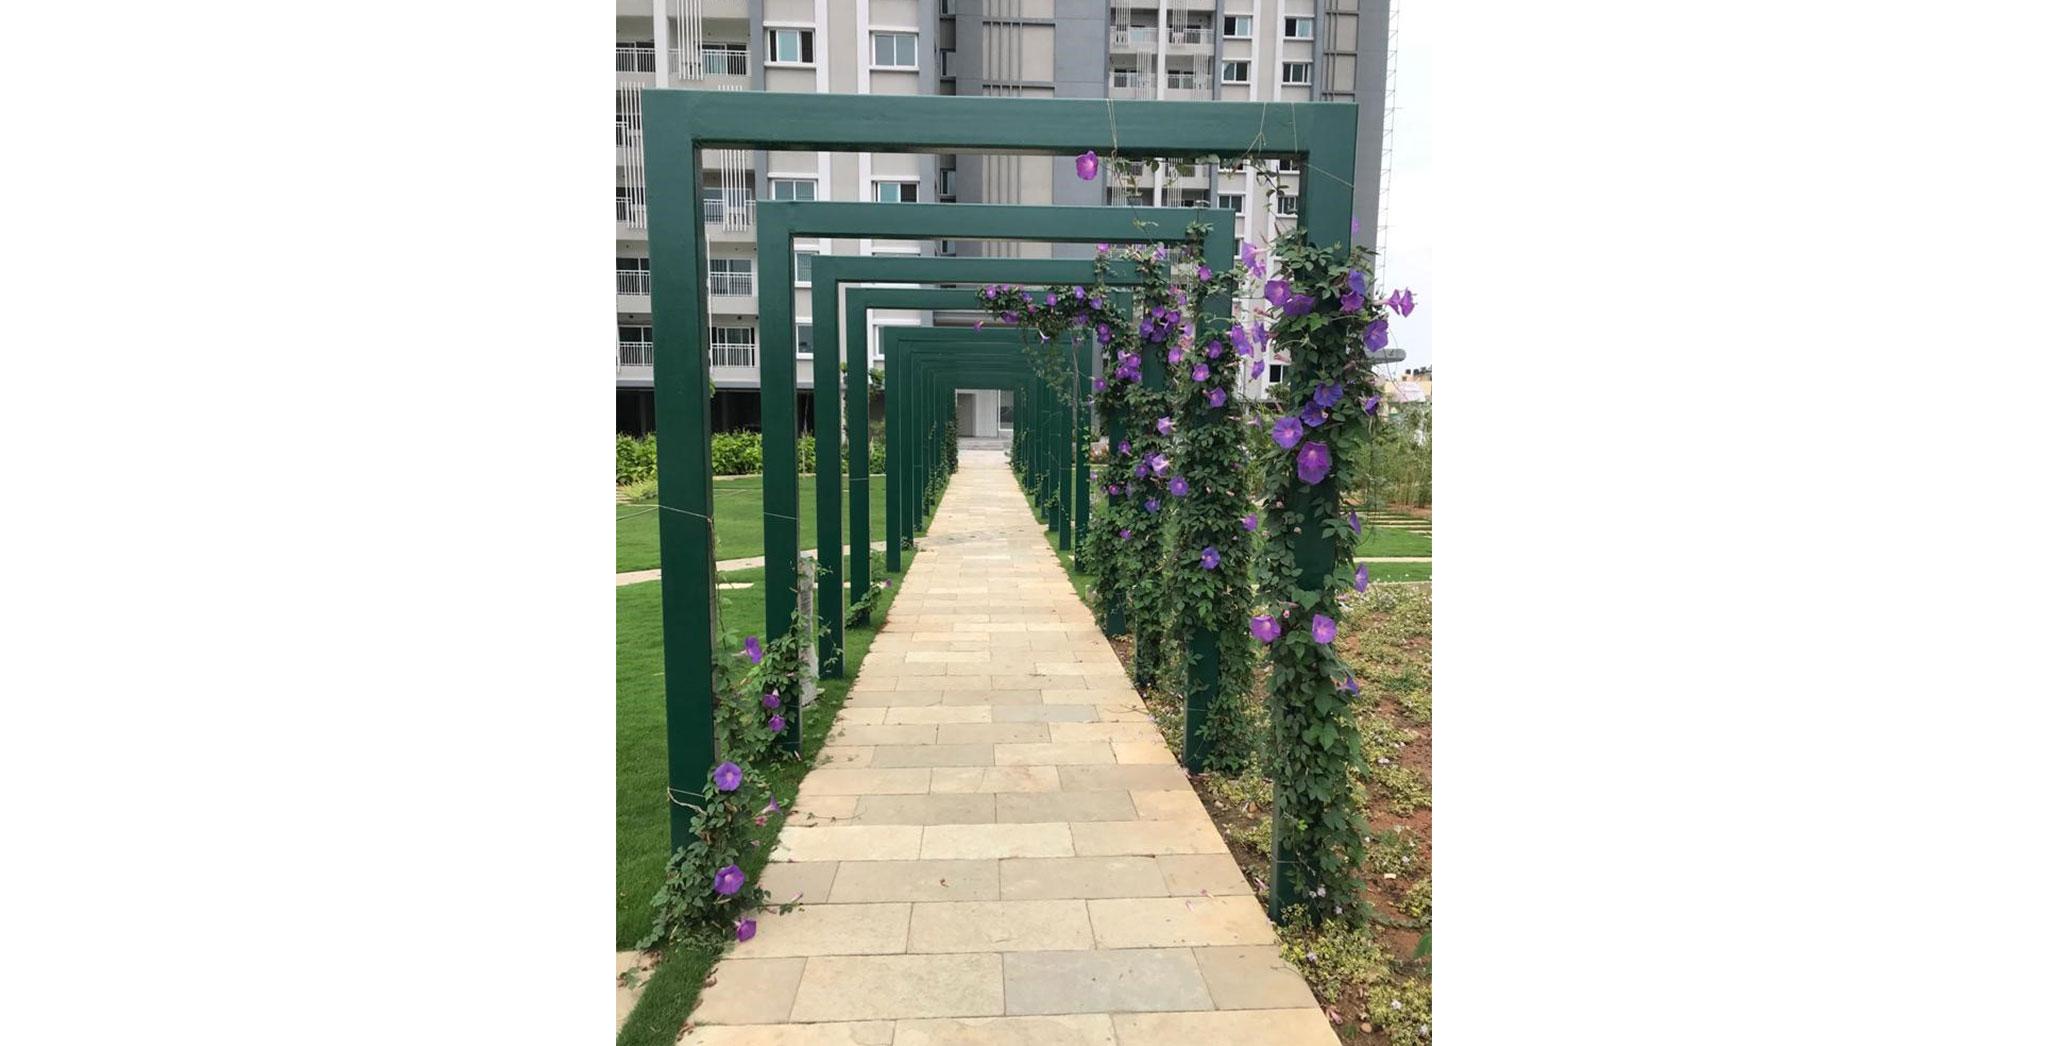 Apr 2021 - Stone pathway